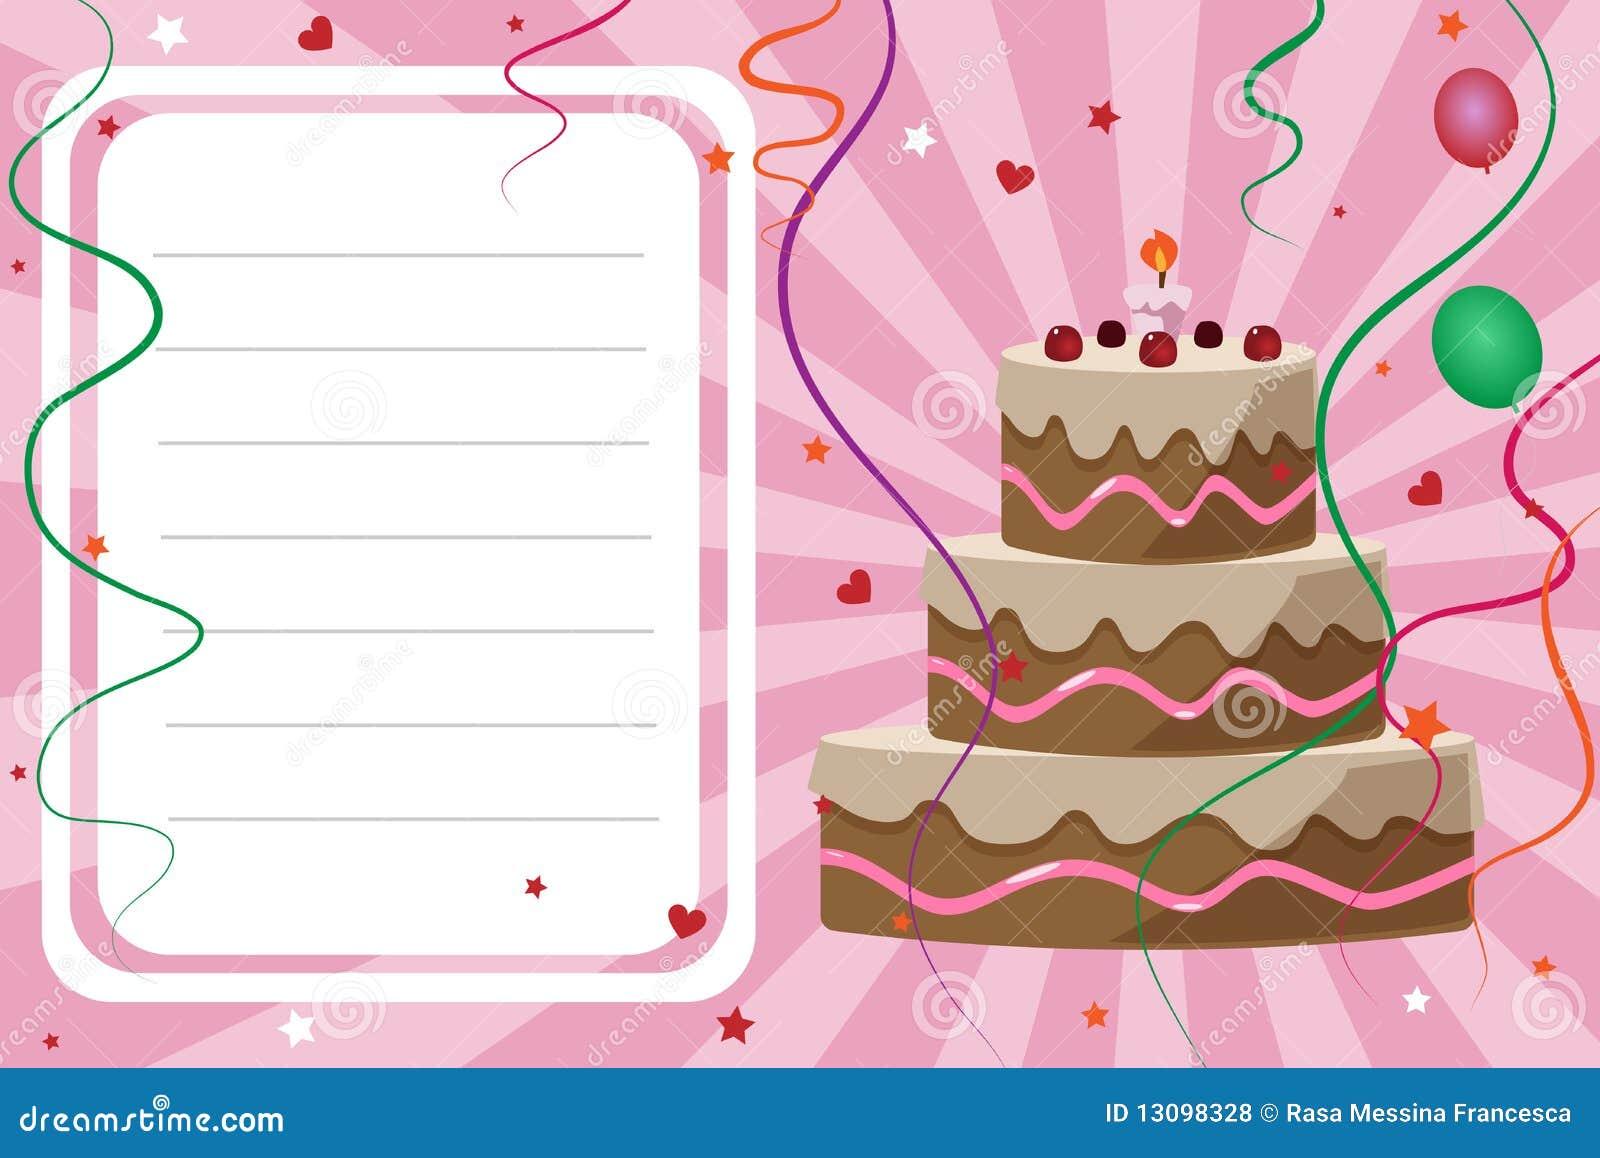 Congratulations birthday phrases